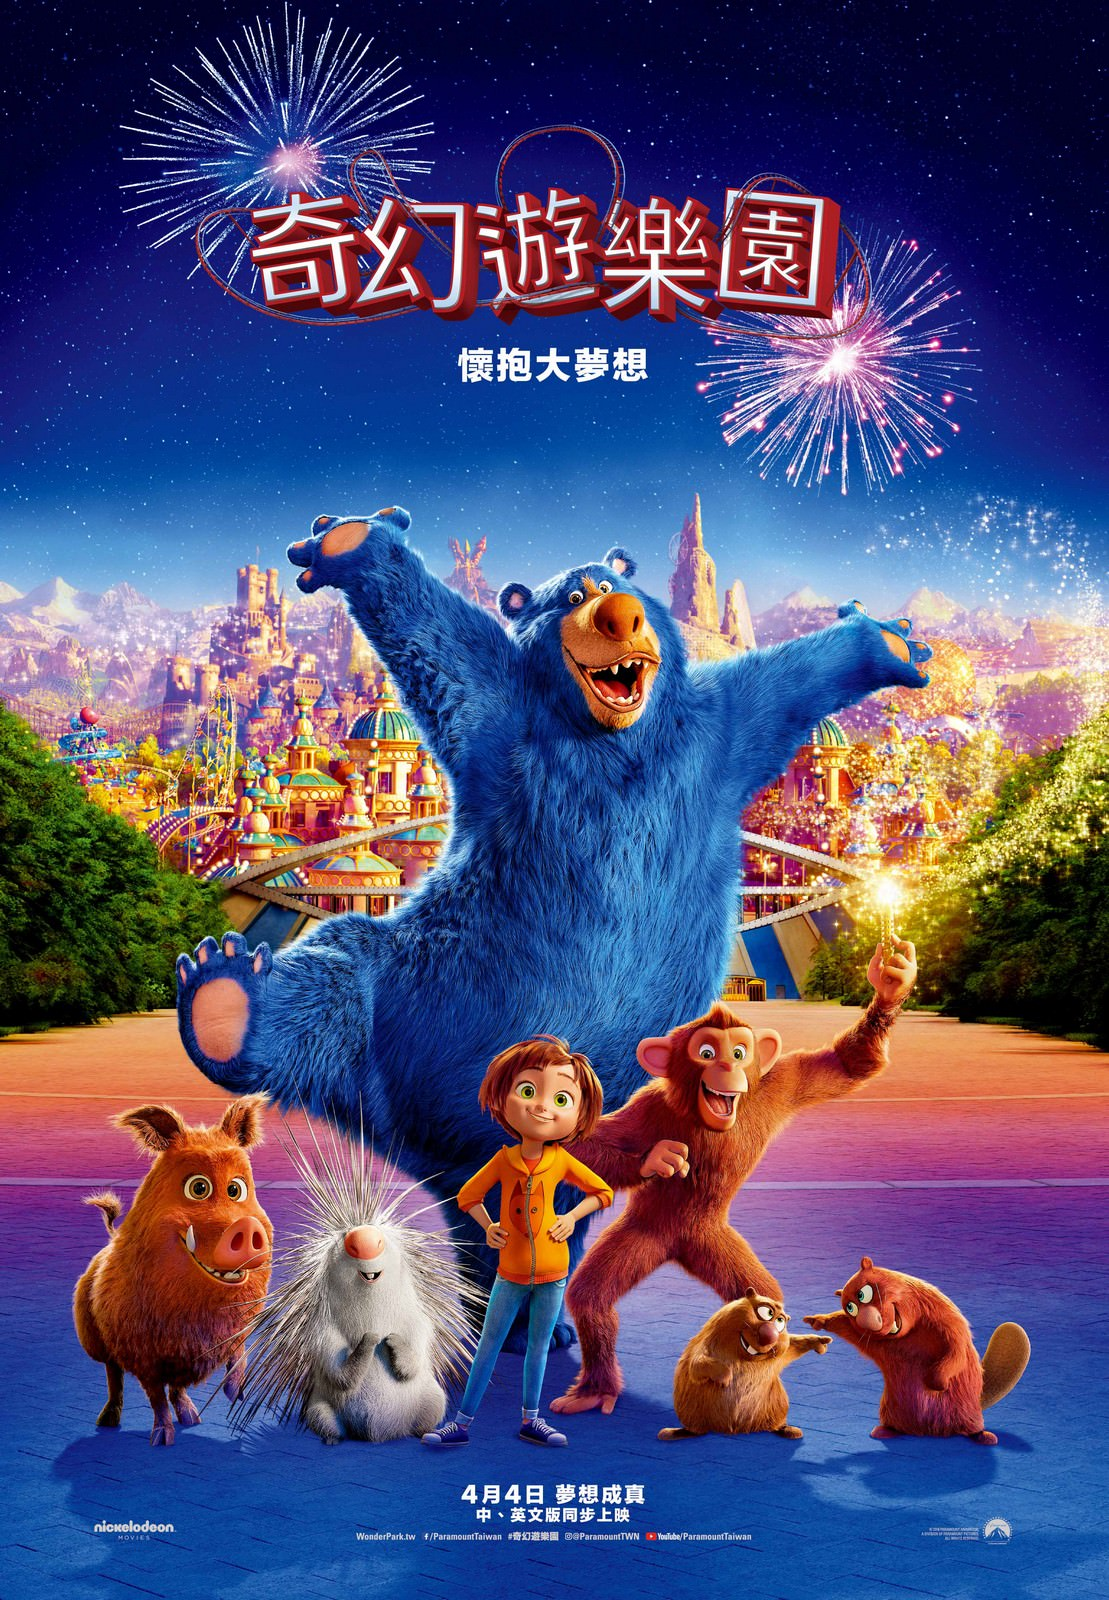 Movie, Wonder Park(美國, 2019年) / 奇幻遊樂園(台灣) / 神奇乐园历险记(中國) / 神奇夢樂園(香港), 電影海報, 台灣